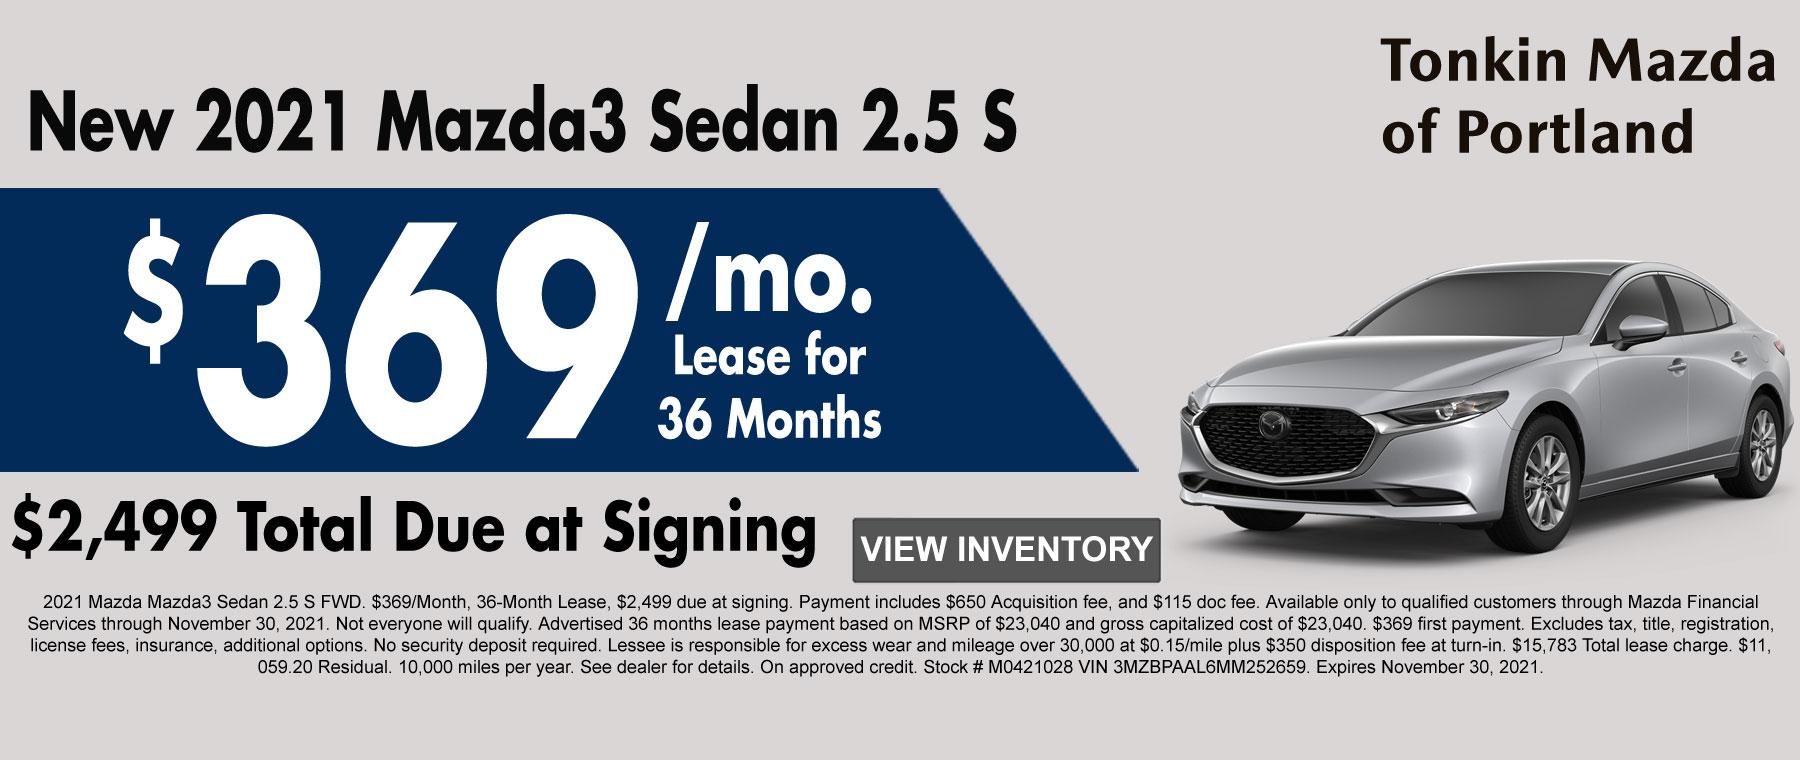 New 2020 Mazda3 Sedan AWD Special